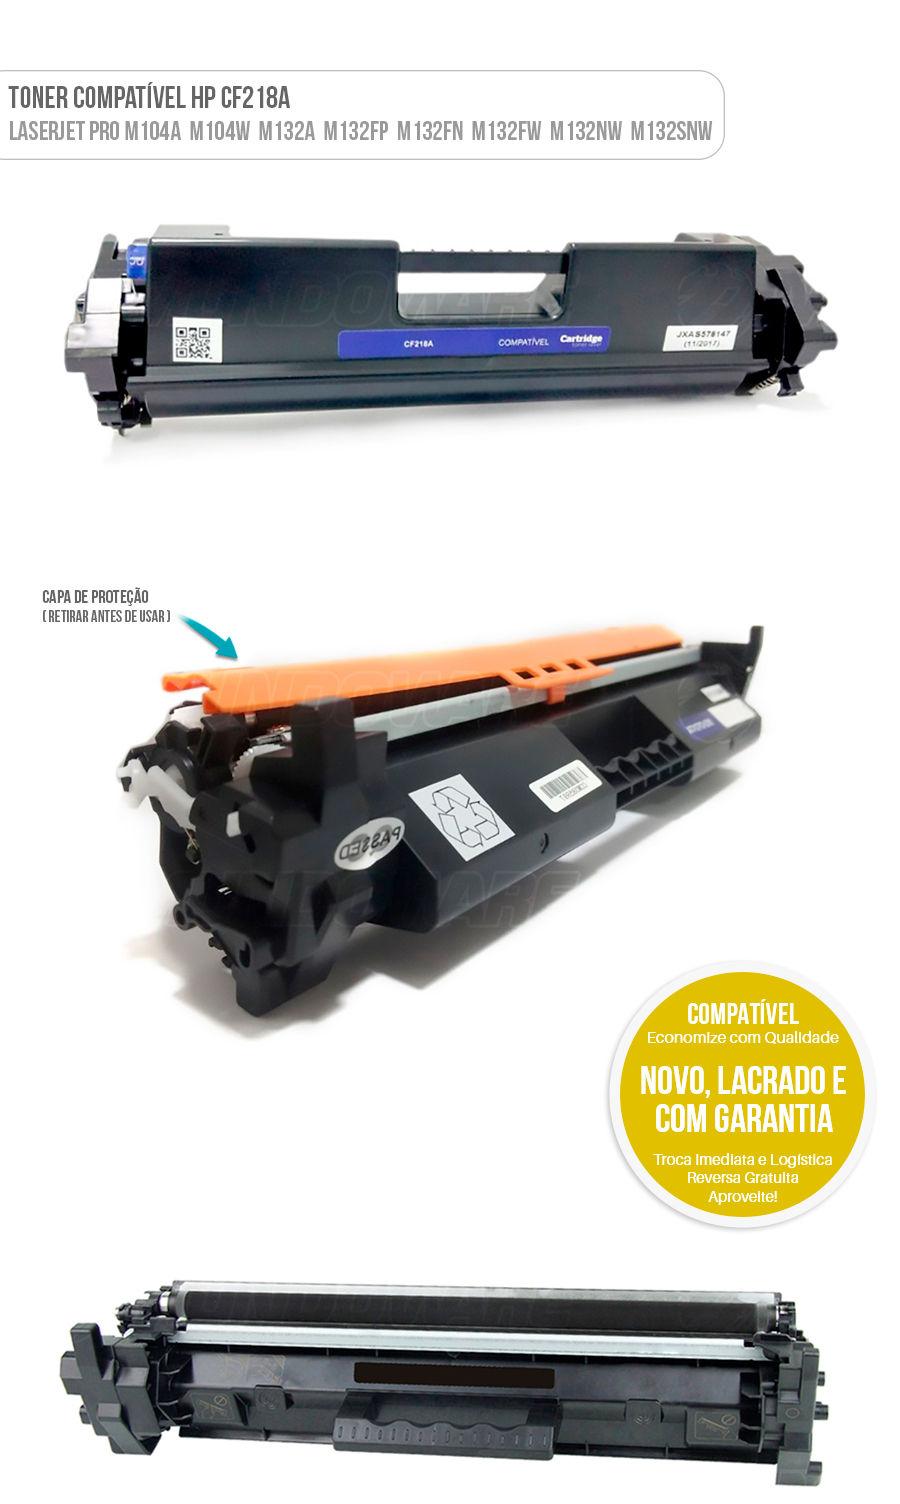 Toner Compativel CF218A 18A para HP Laserjet Pro M104 M104A M104W M132 M132A MFP M132FP MFP M132FN MFP M132FW MFP M132NW MFP M132SNW